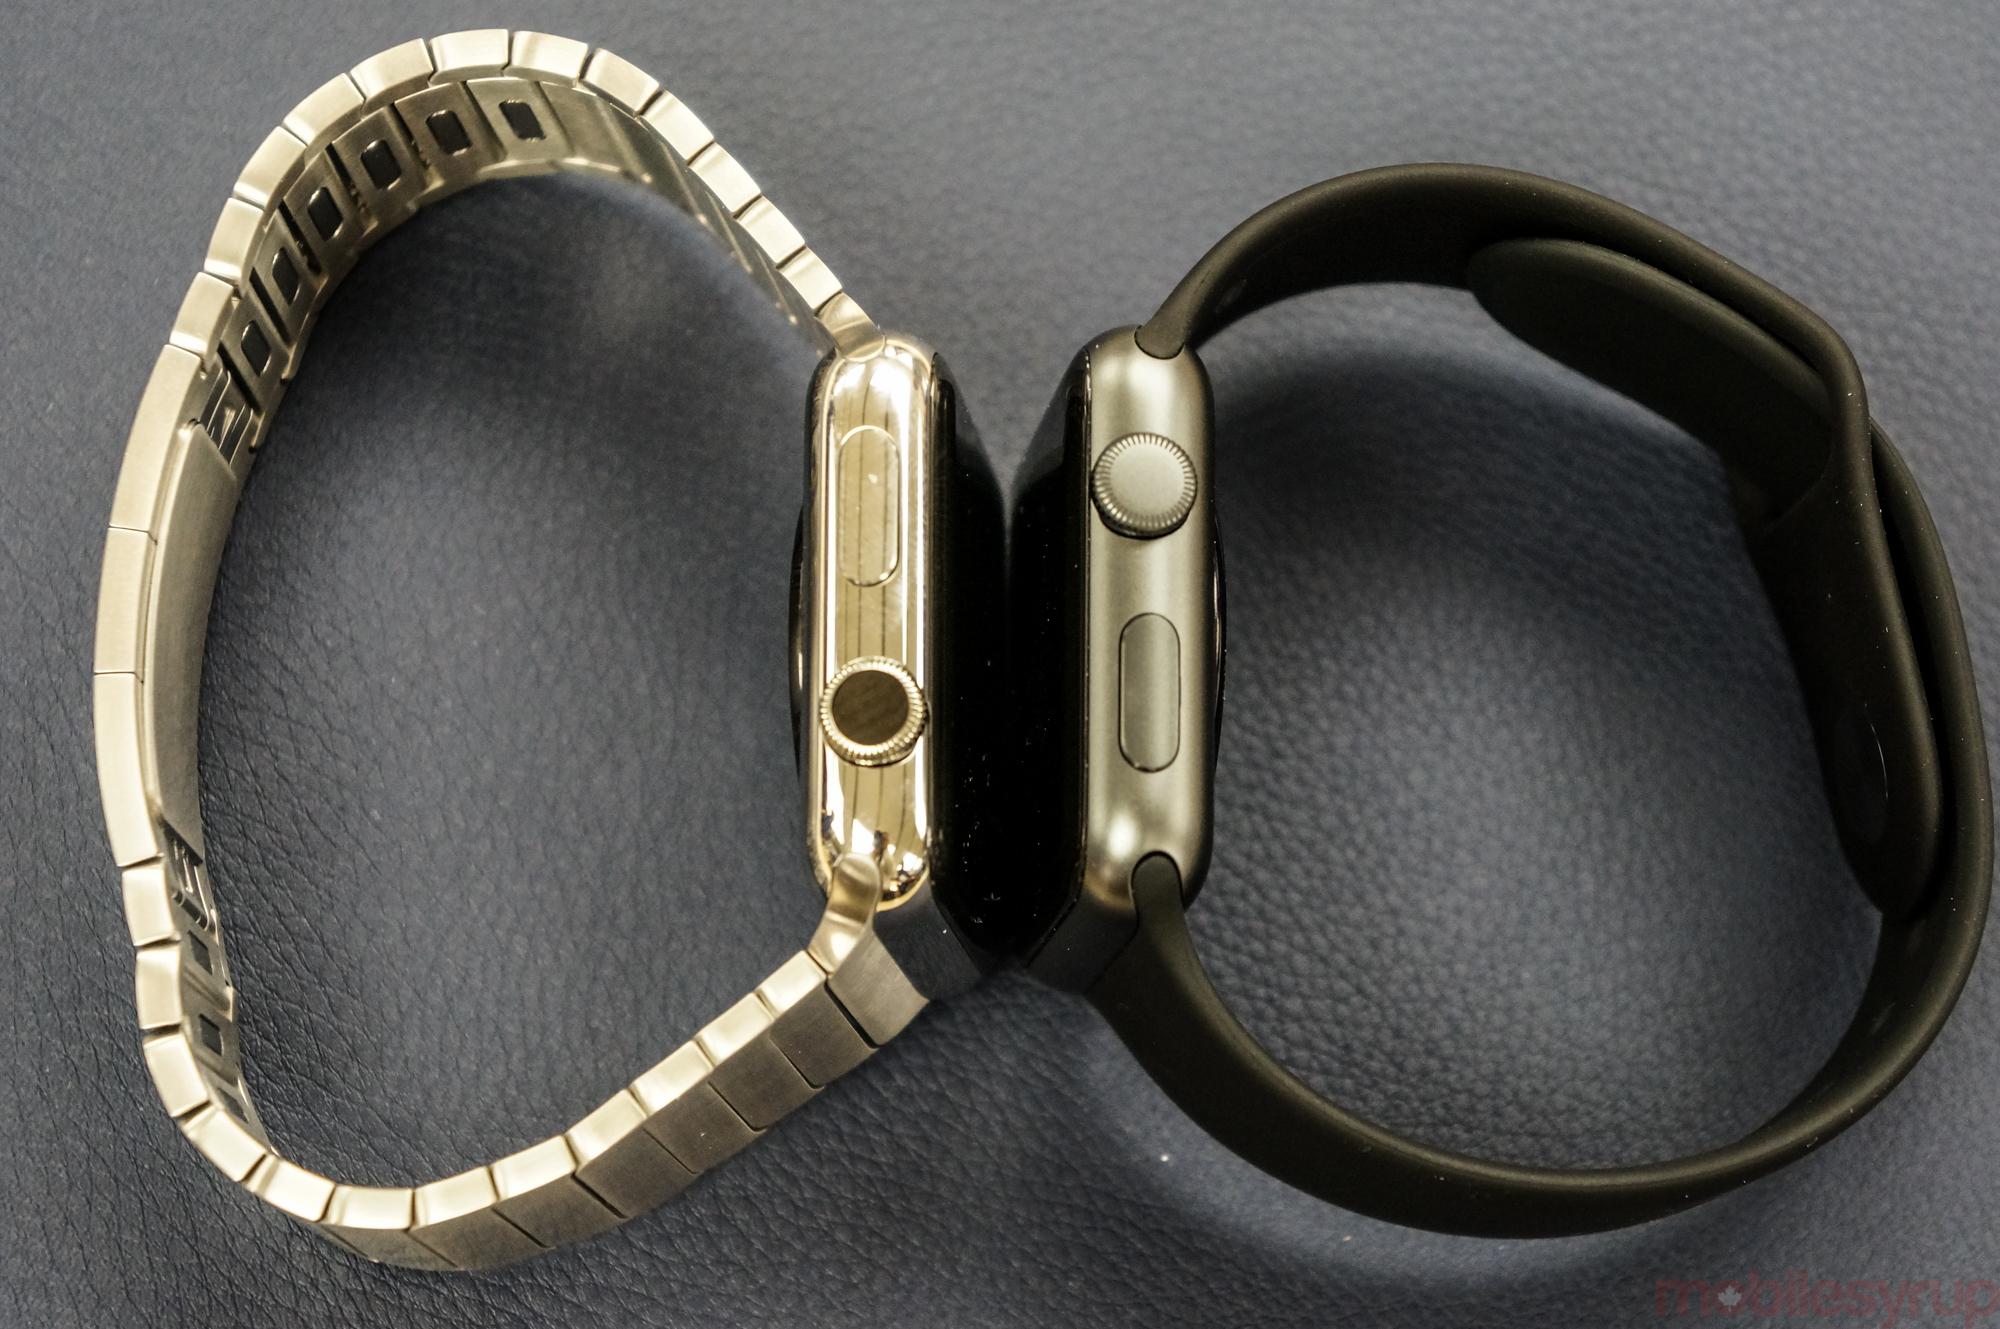 applewatchpreorder-03550